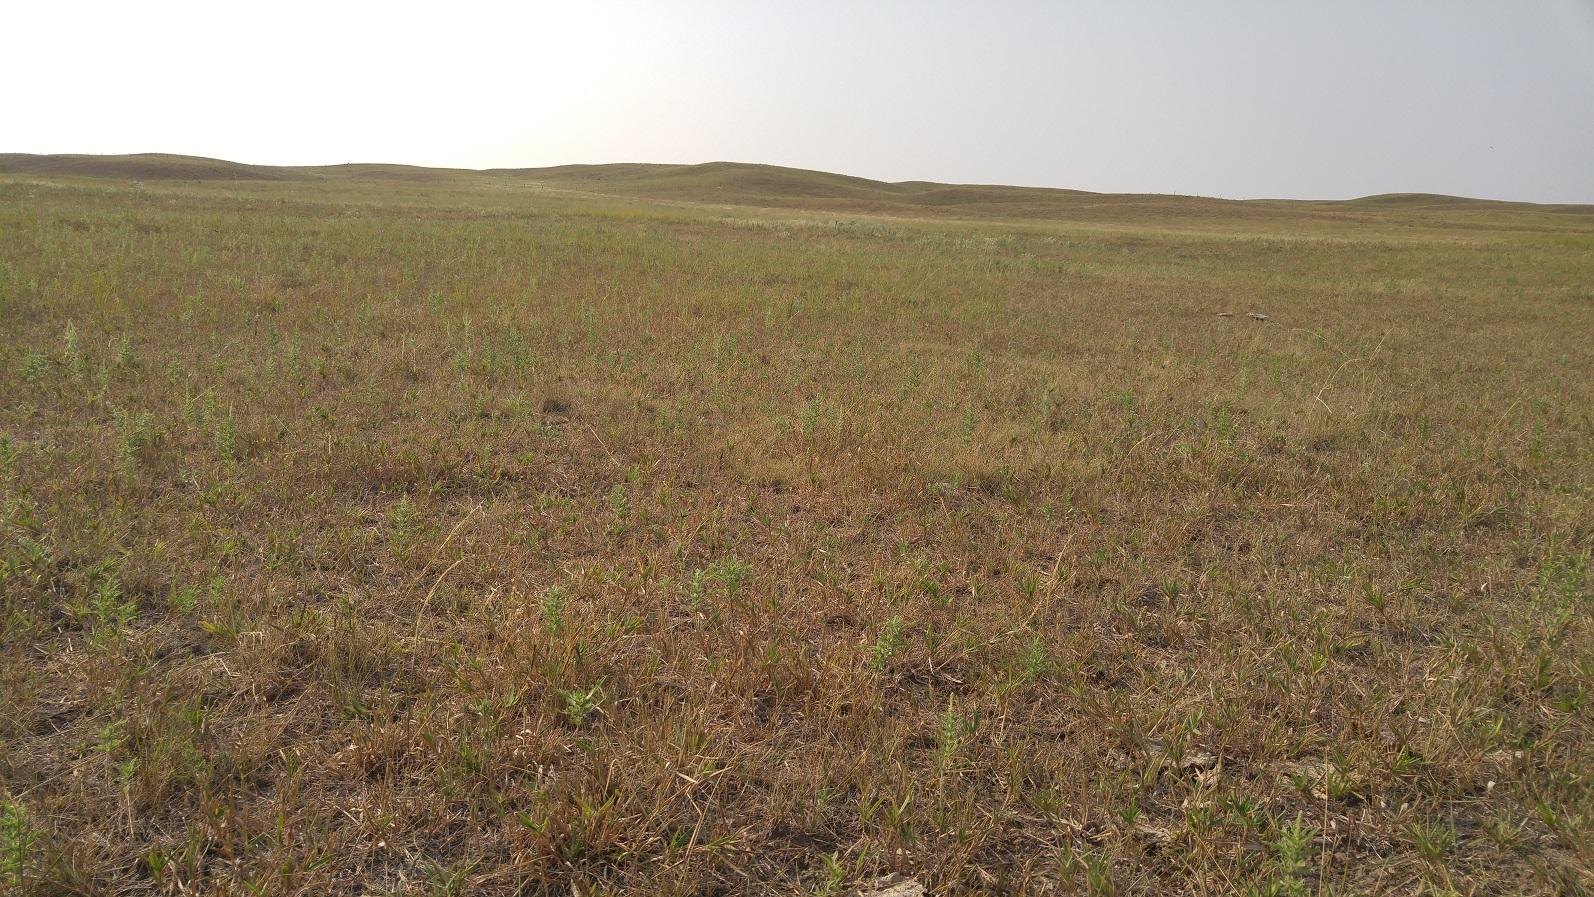 Grazed pasture